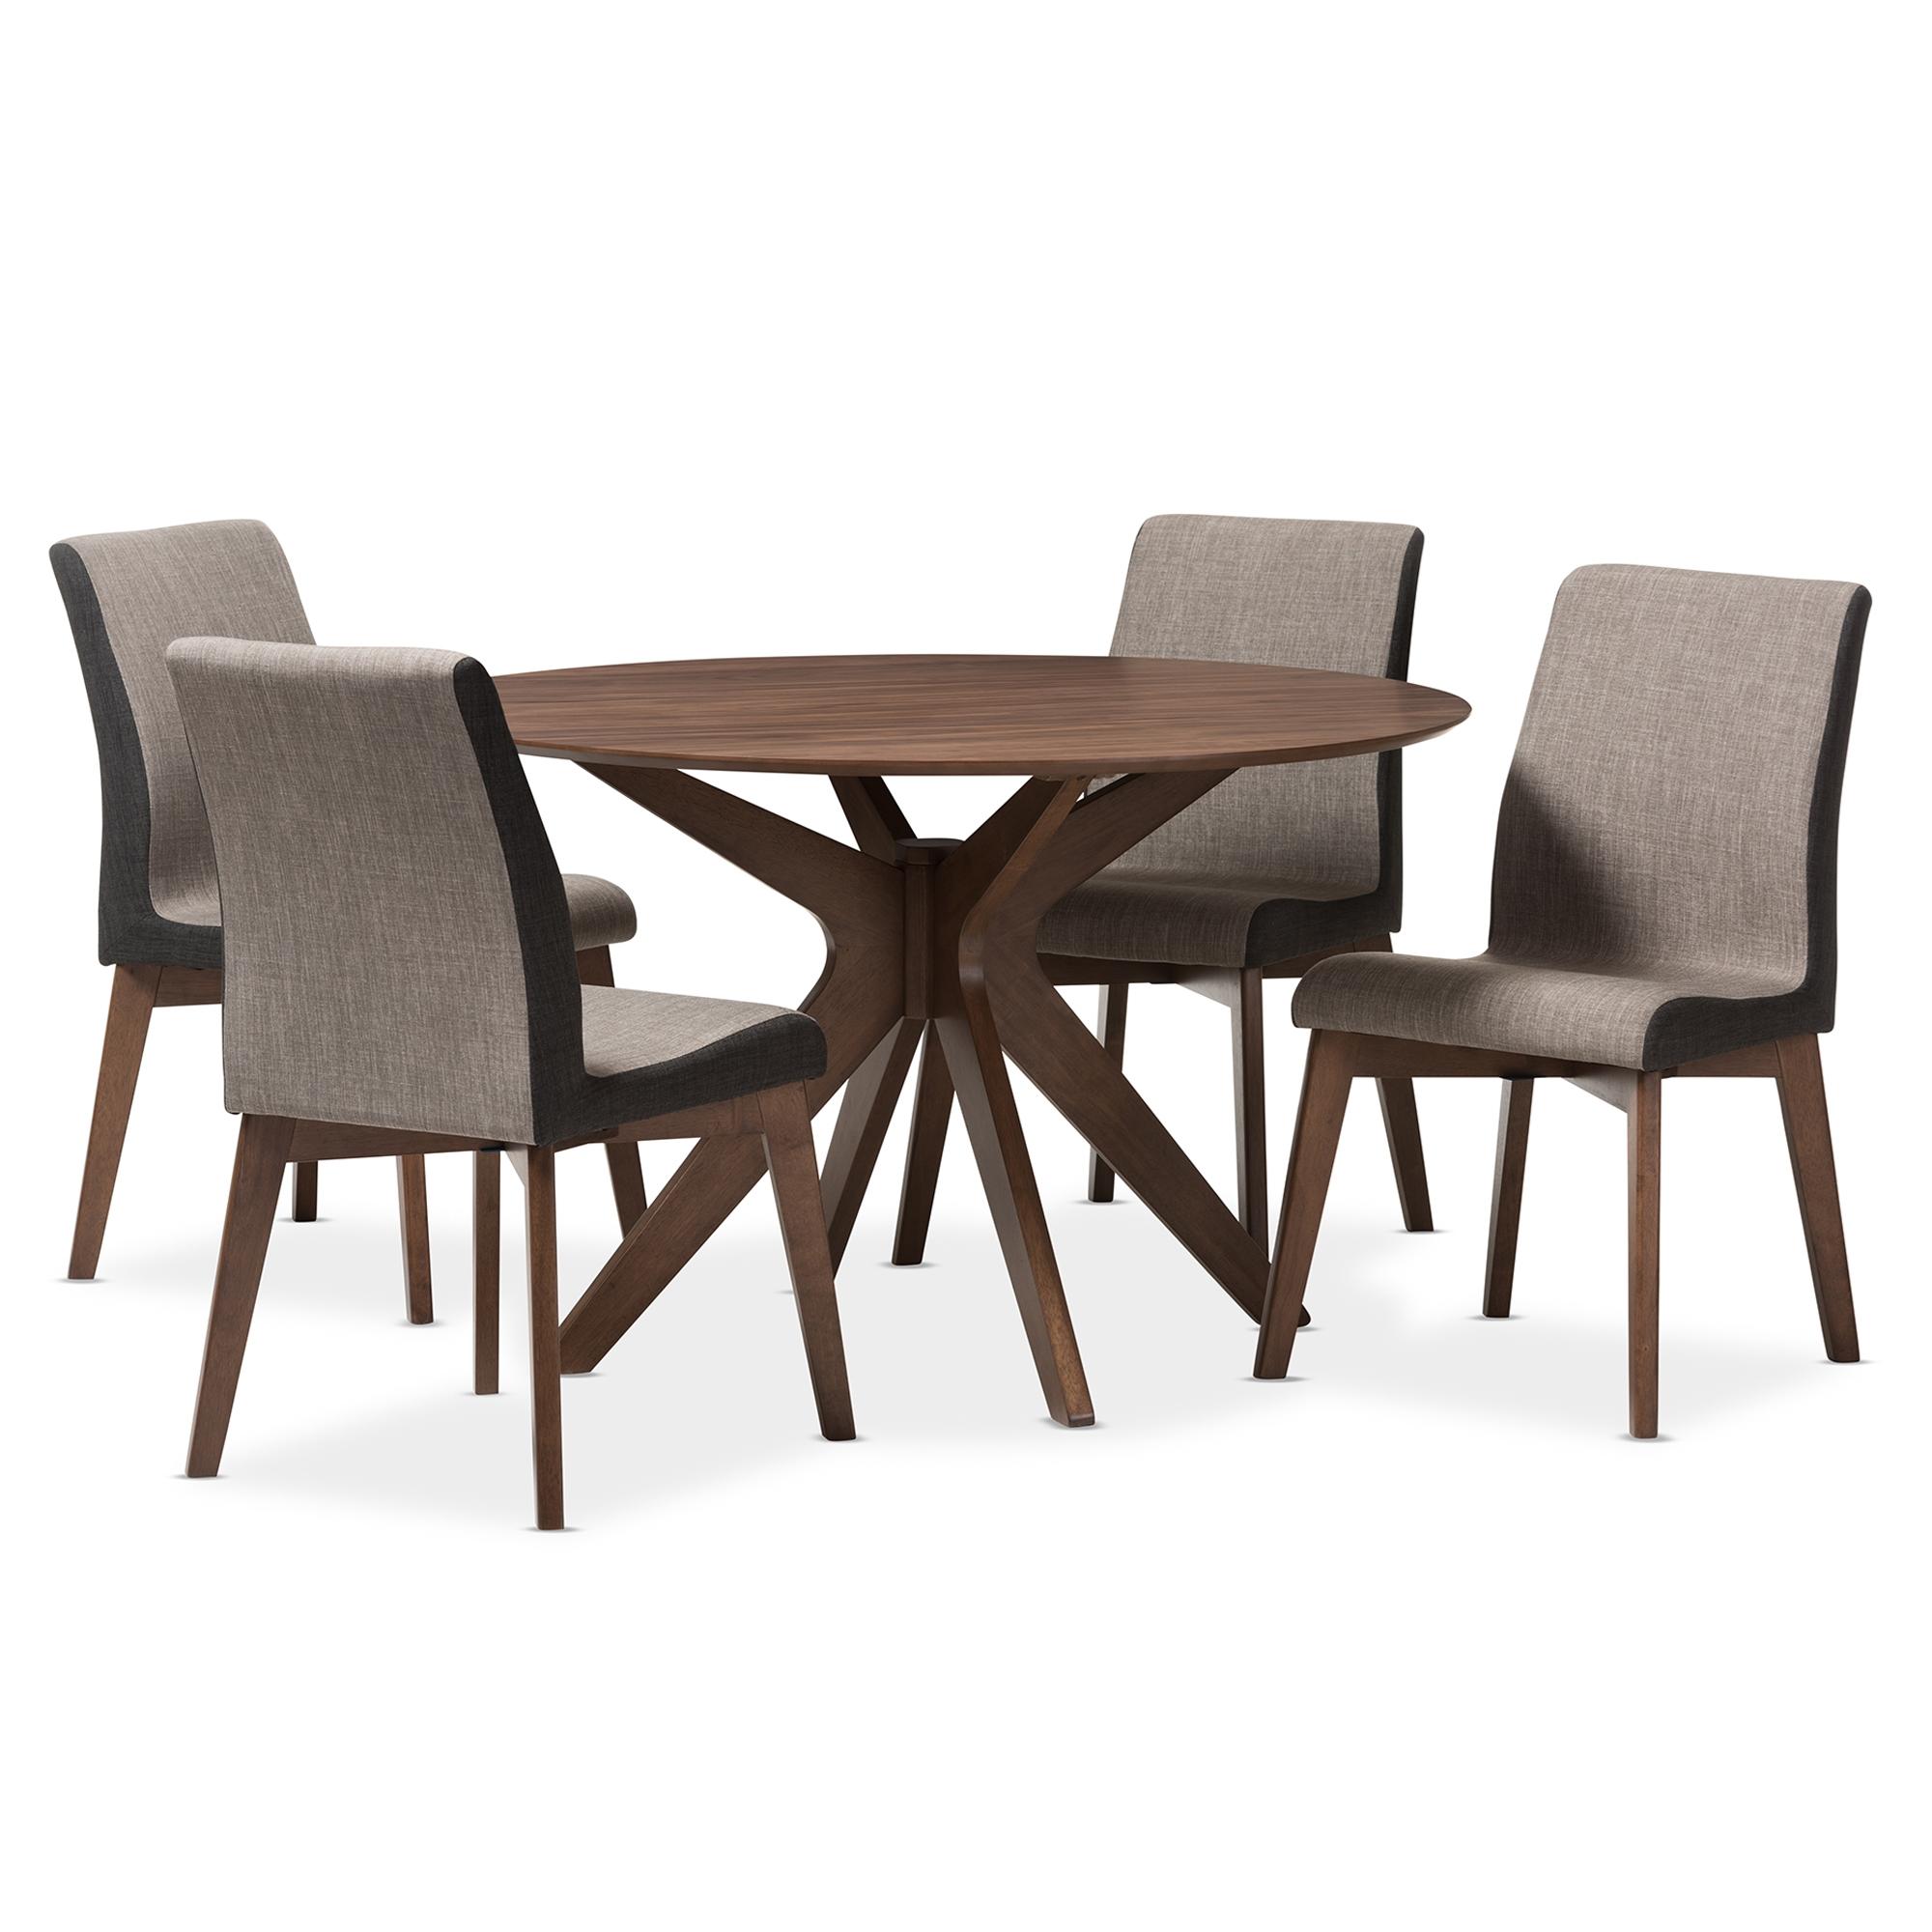 Baxton Studio Kimberly Mid Century Modern Walnut Wood Round 5 Piece Dining  Set ...